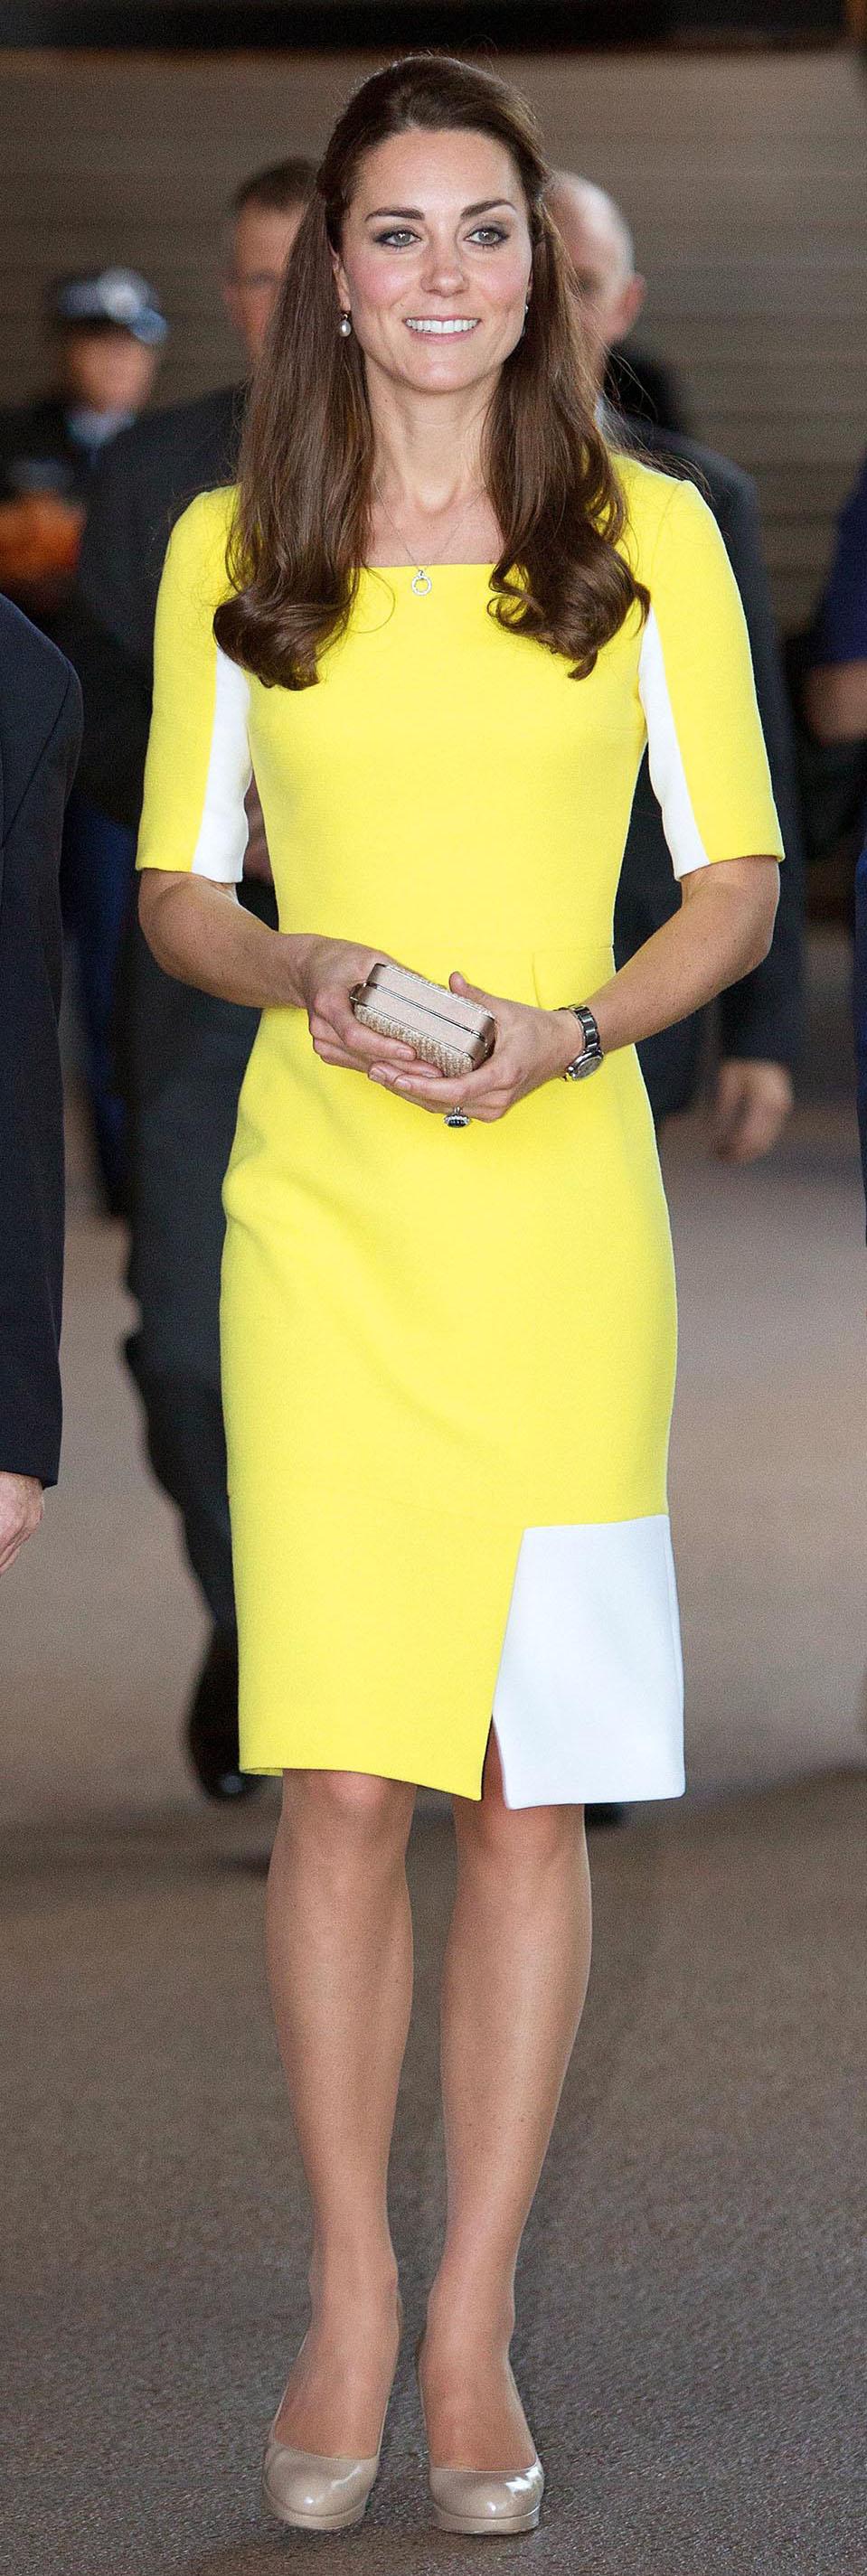 Kate middleton yellow dress in australia | Royal Family | Pinterest ...